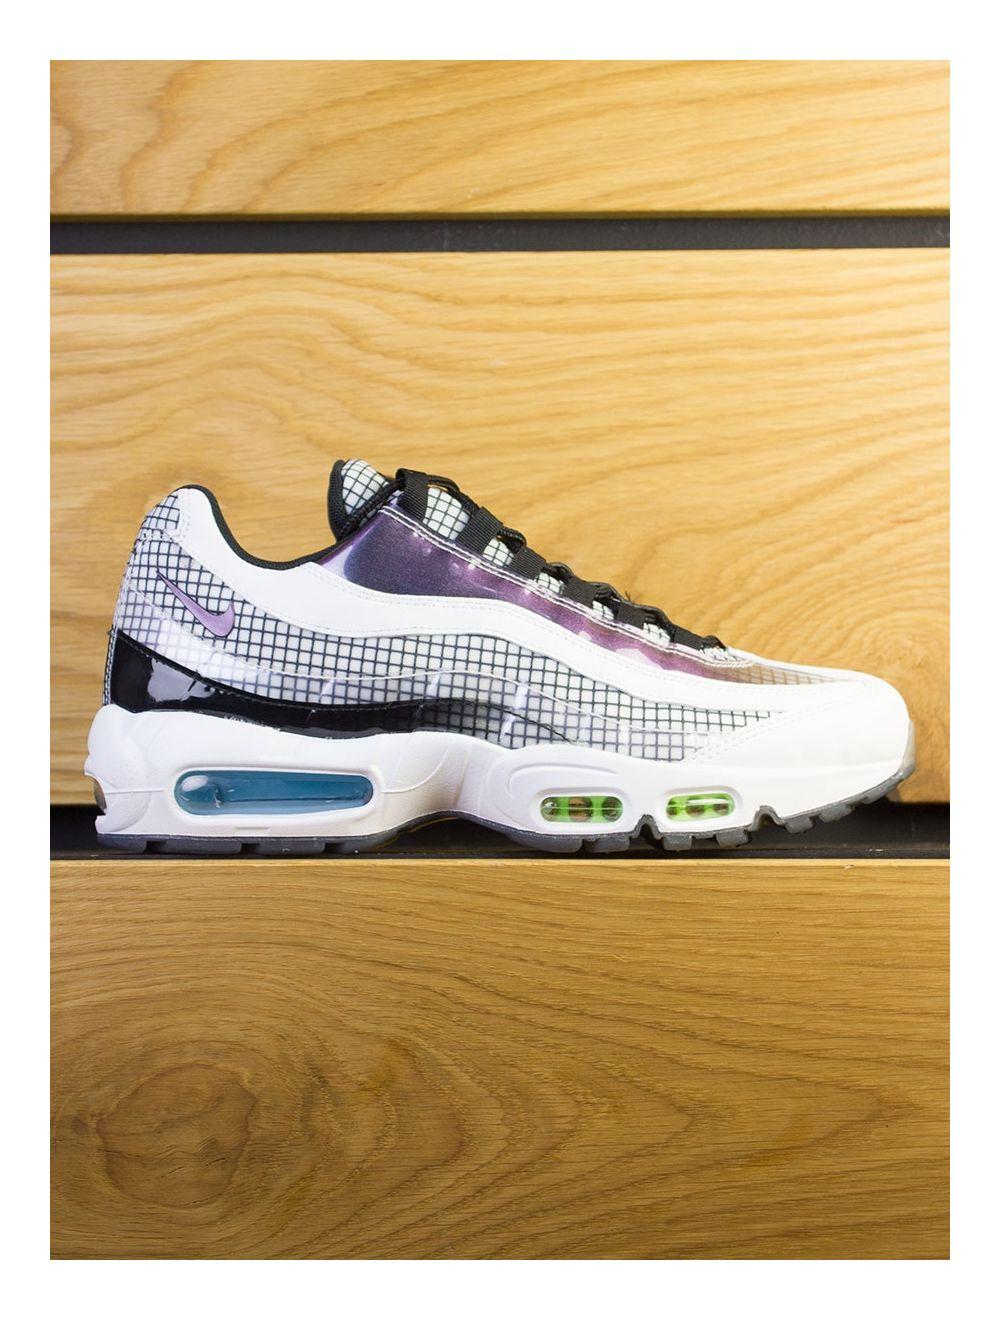 size 40 f71e5 c0939 Nike Air Max 95 LV8 - White Black Blue Glaze